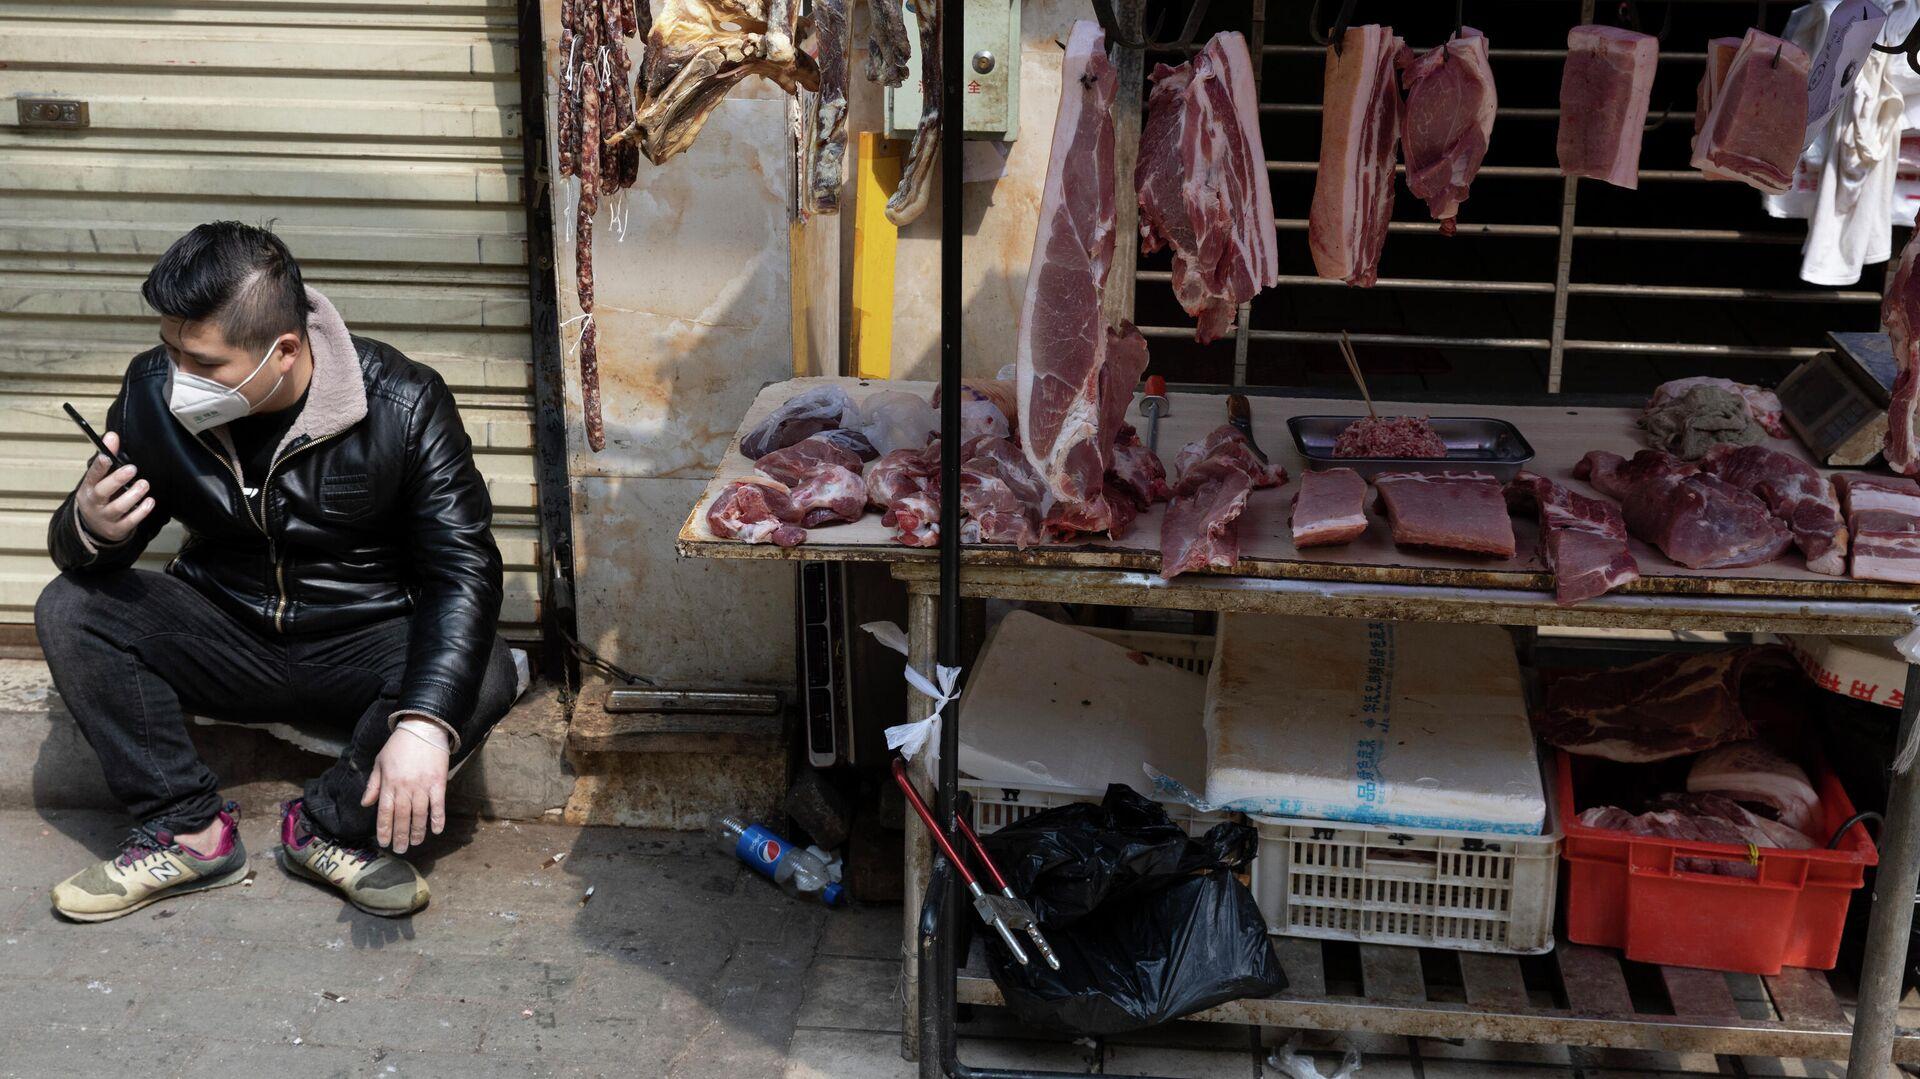 Продавец на рынке в Ухани, КНР - РИА Новости, 1920, 23.11.2020